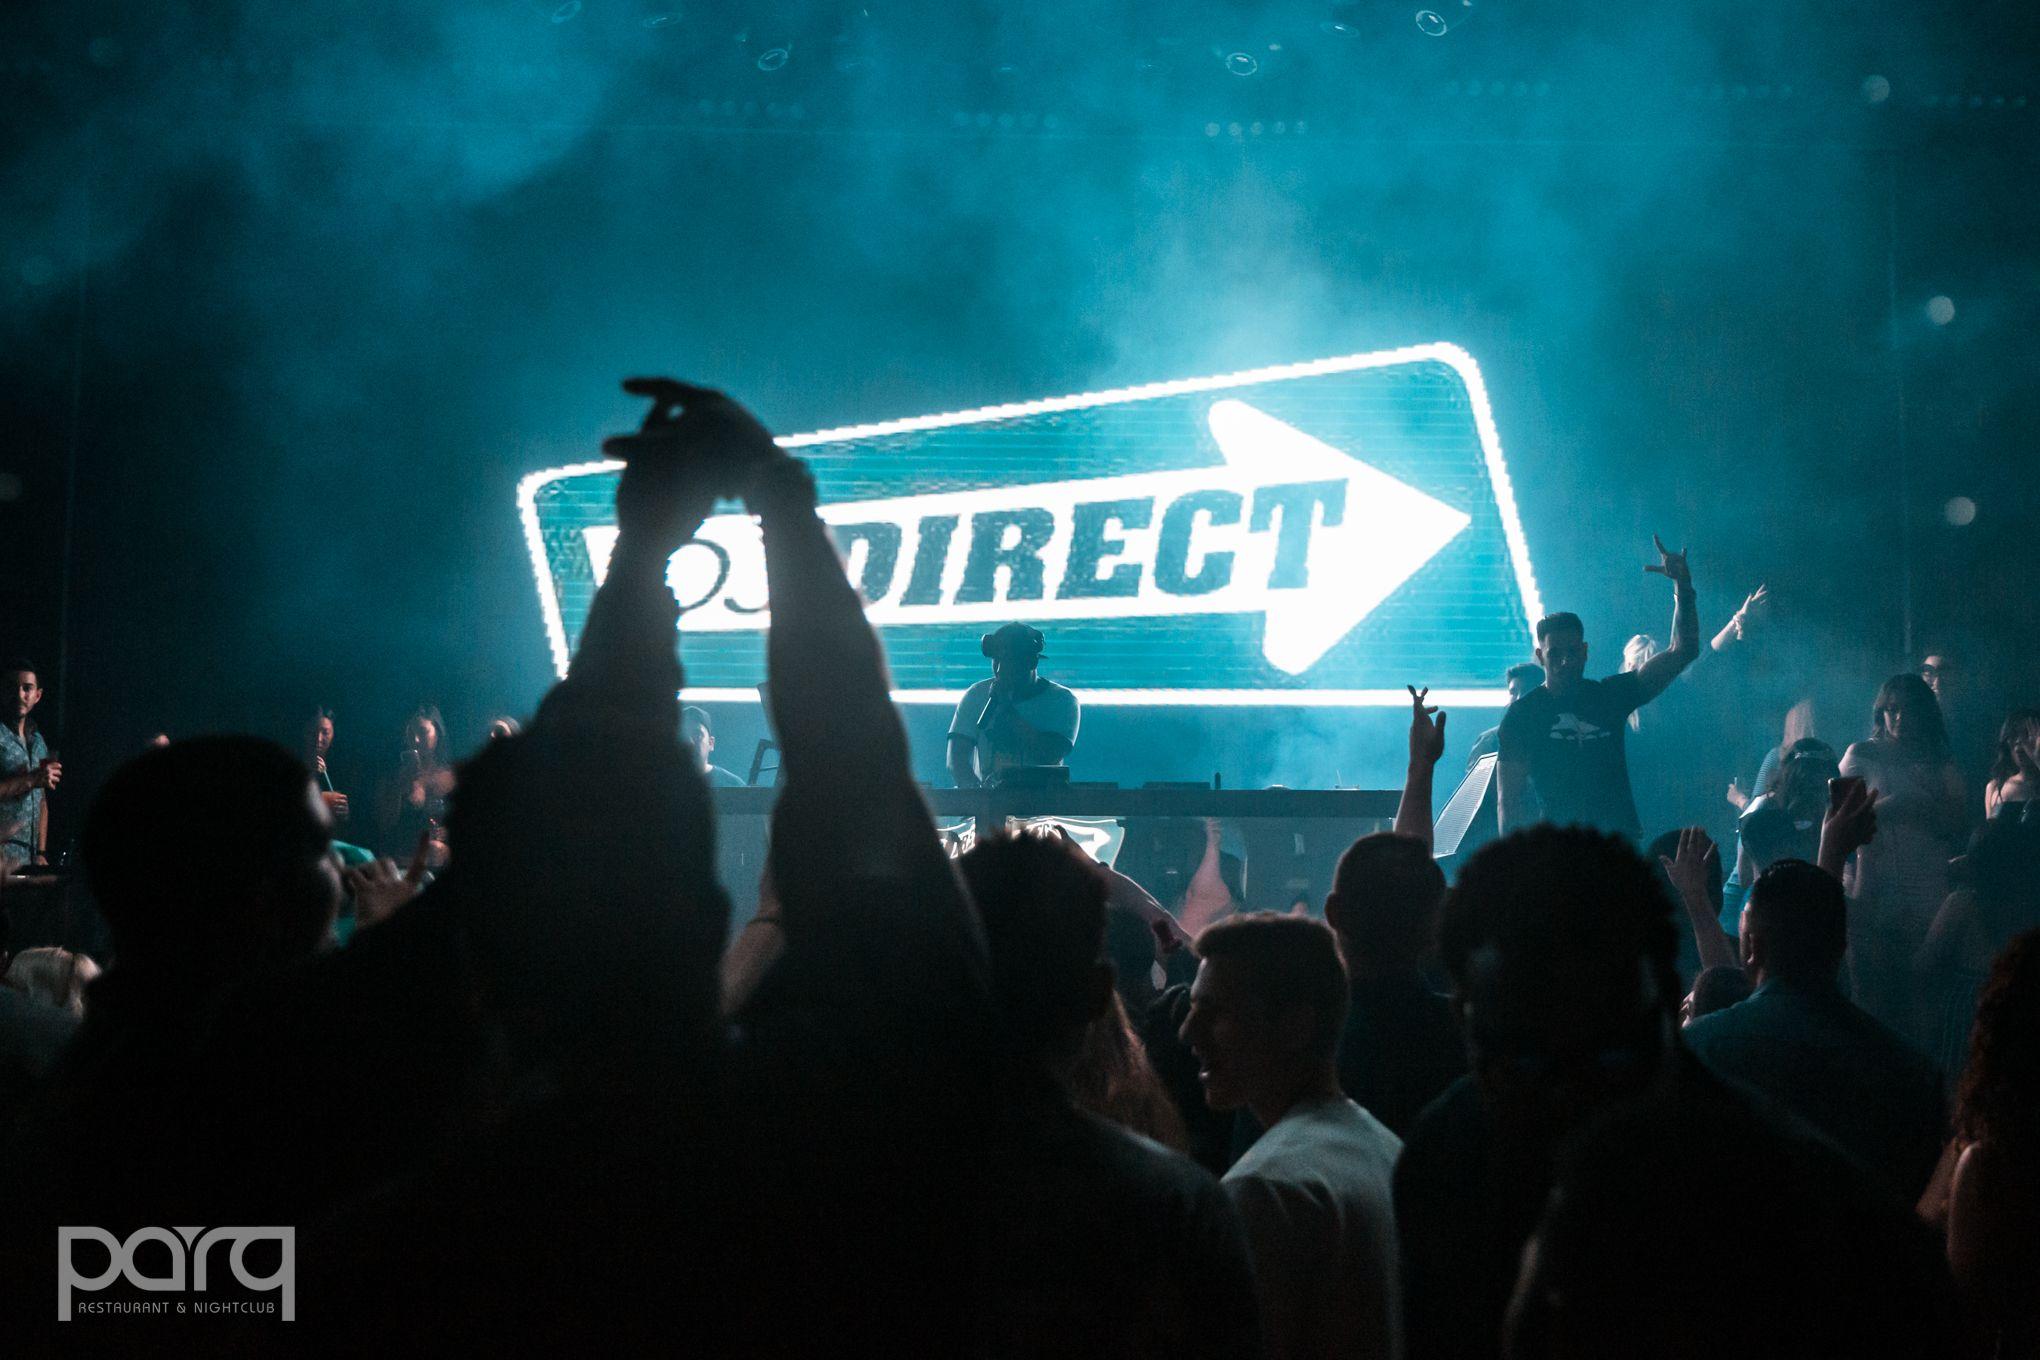 07.27.19 Parq - Direct-1.jpg